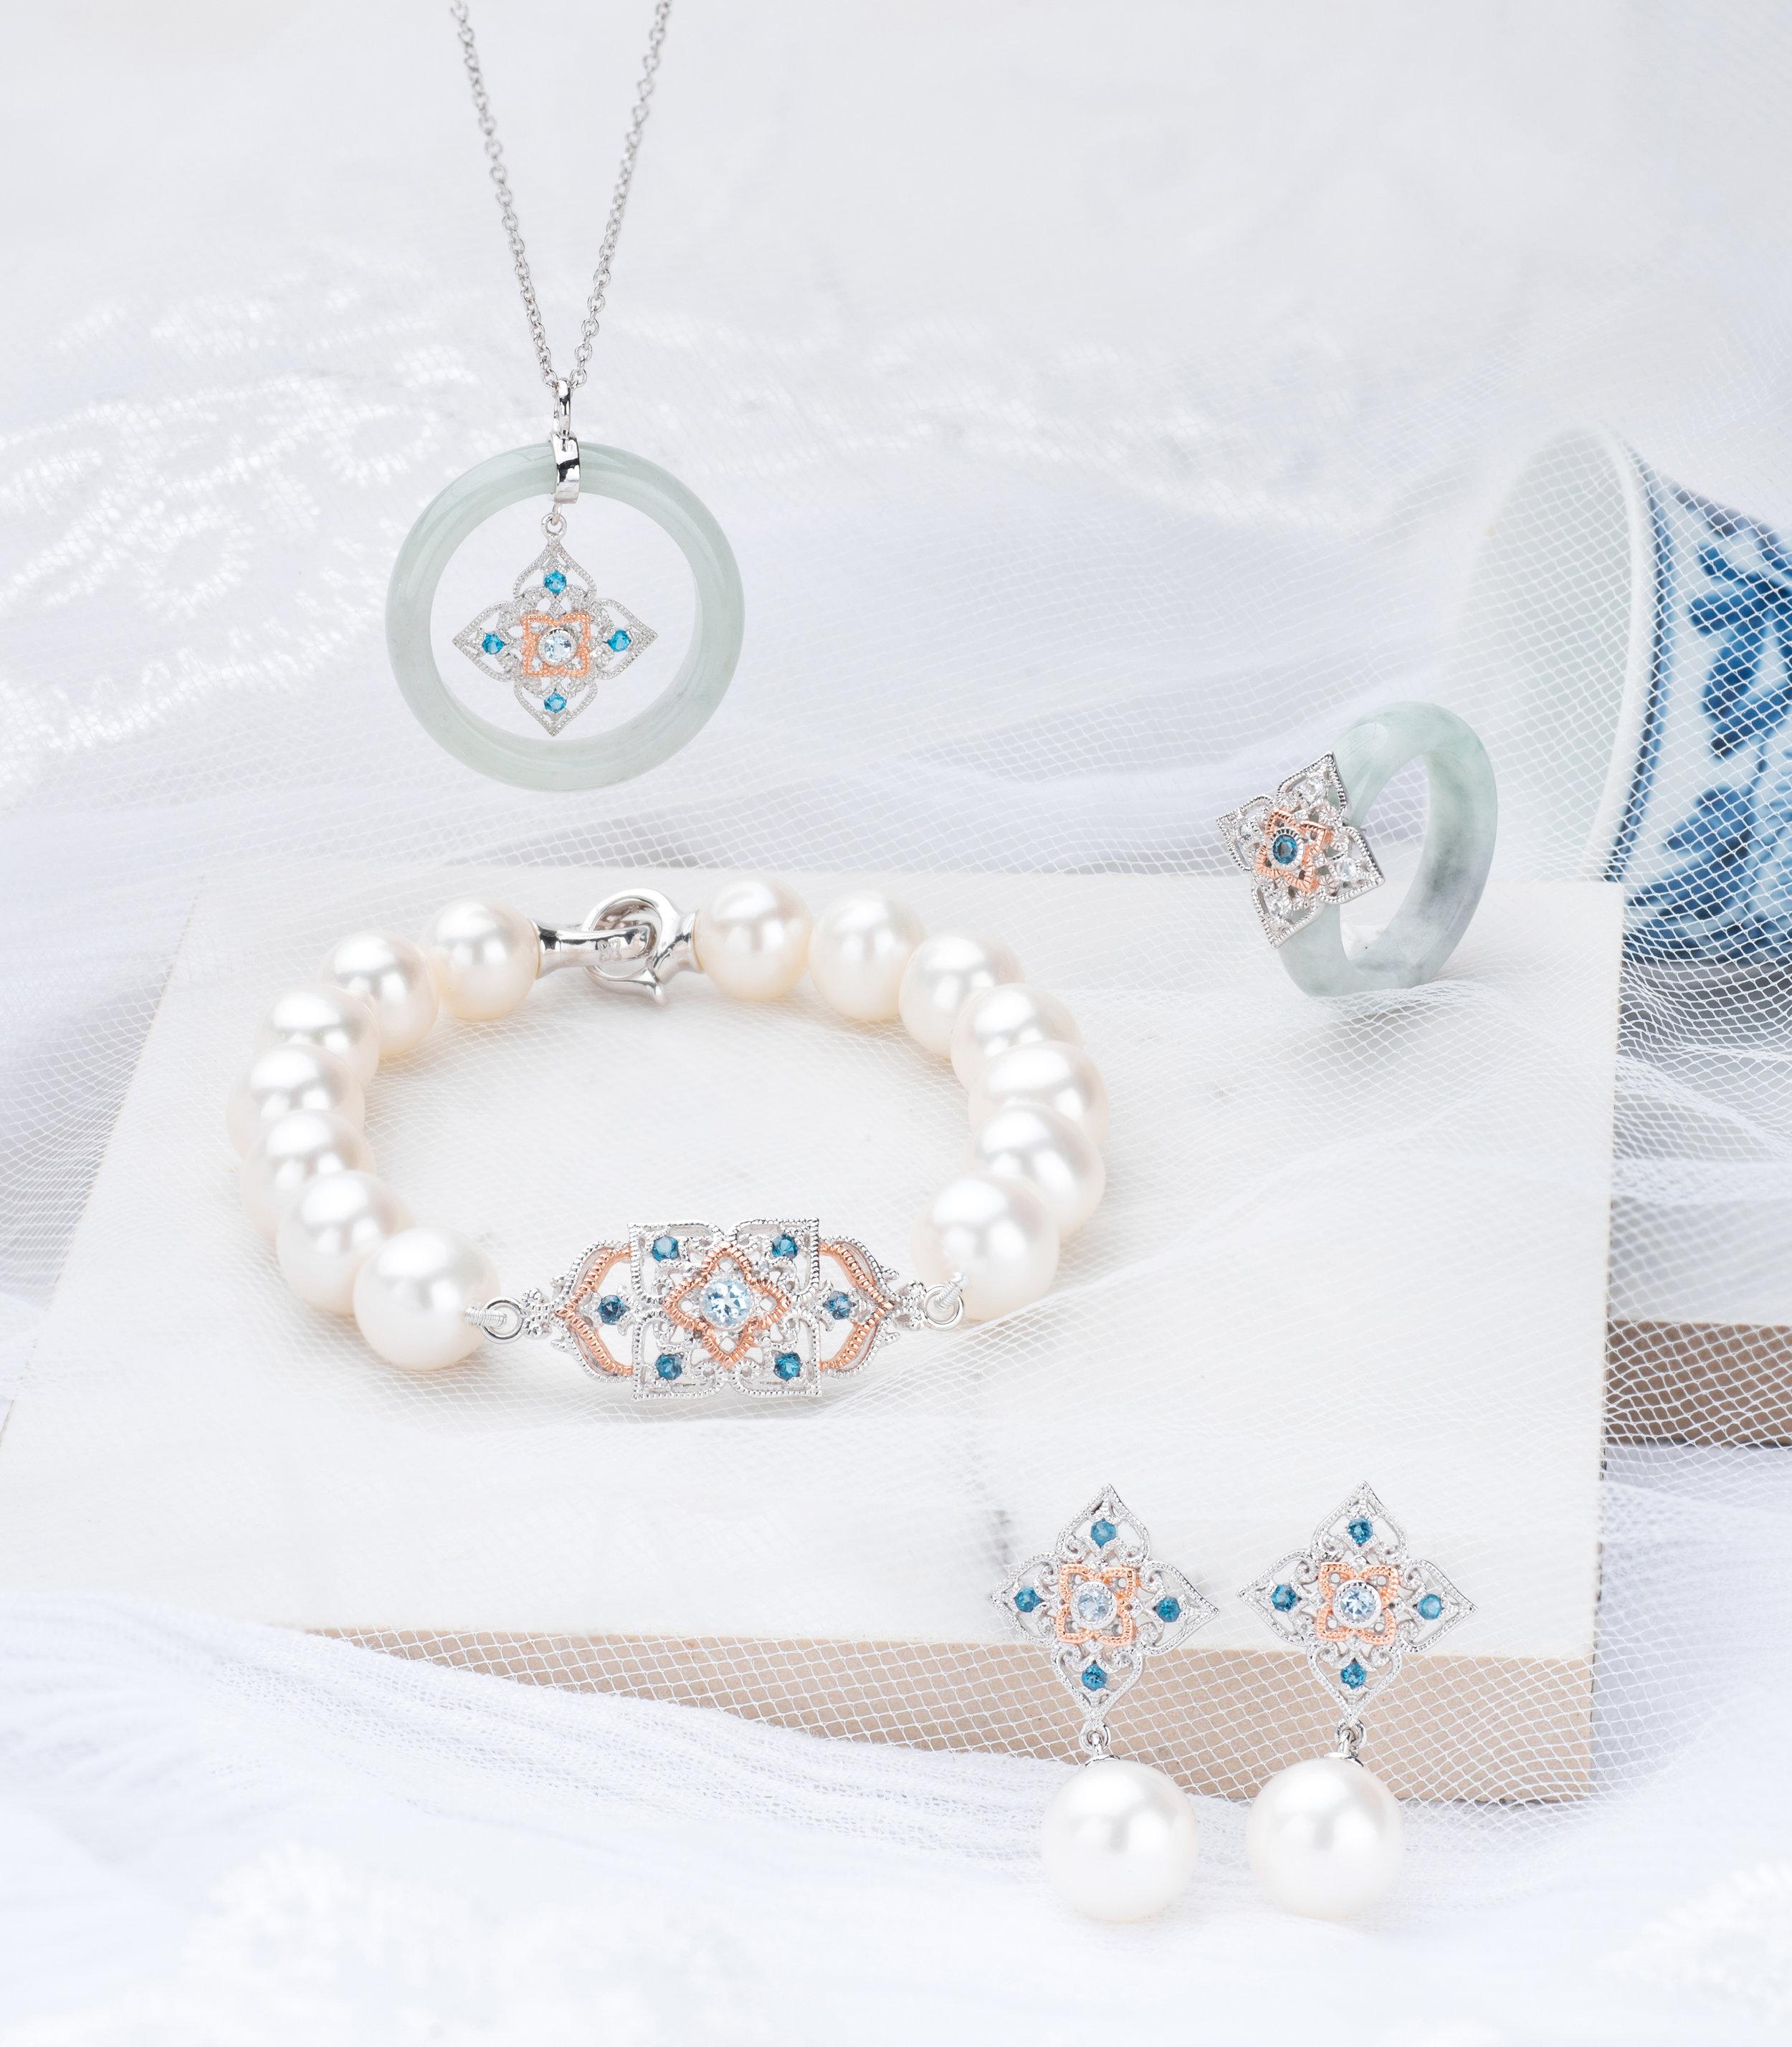 The Choo Yilin Peranakan Pearls Si Dian Jin